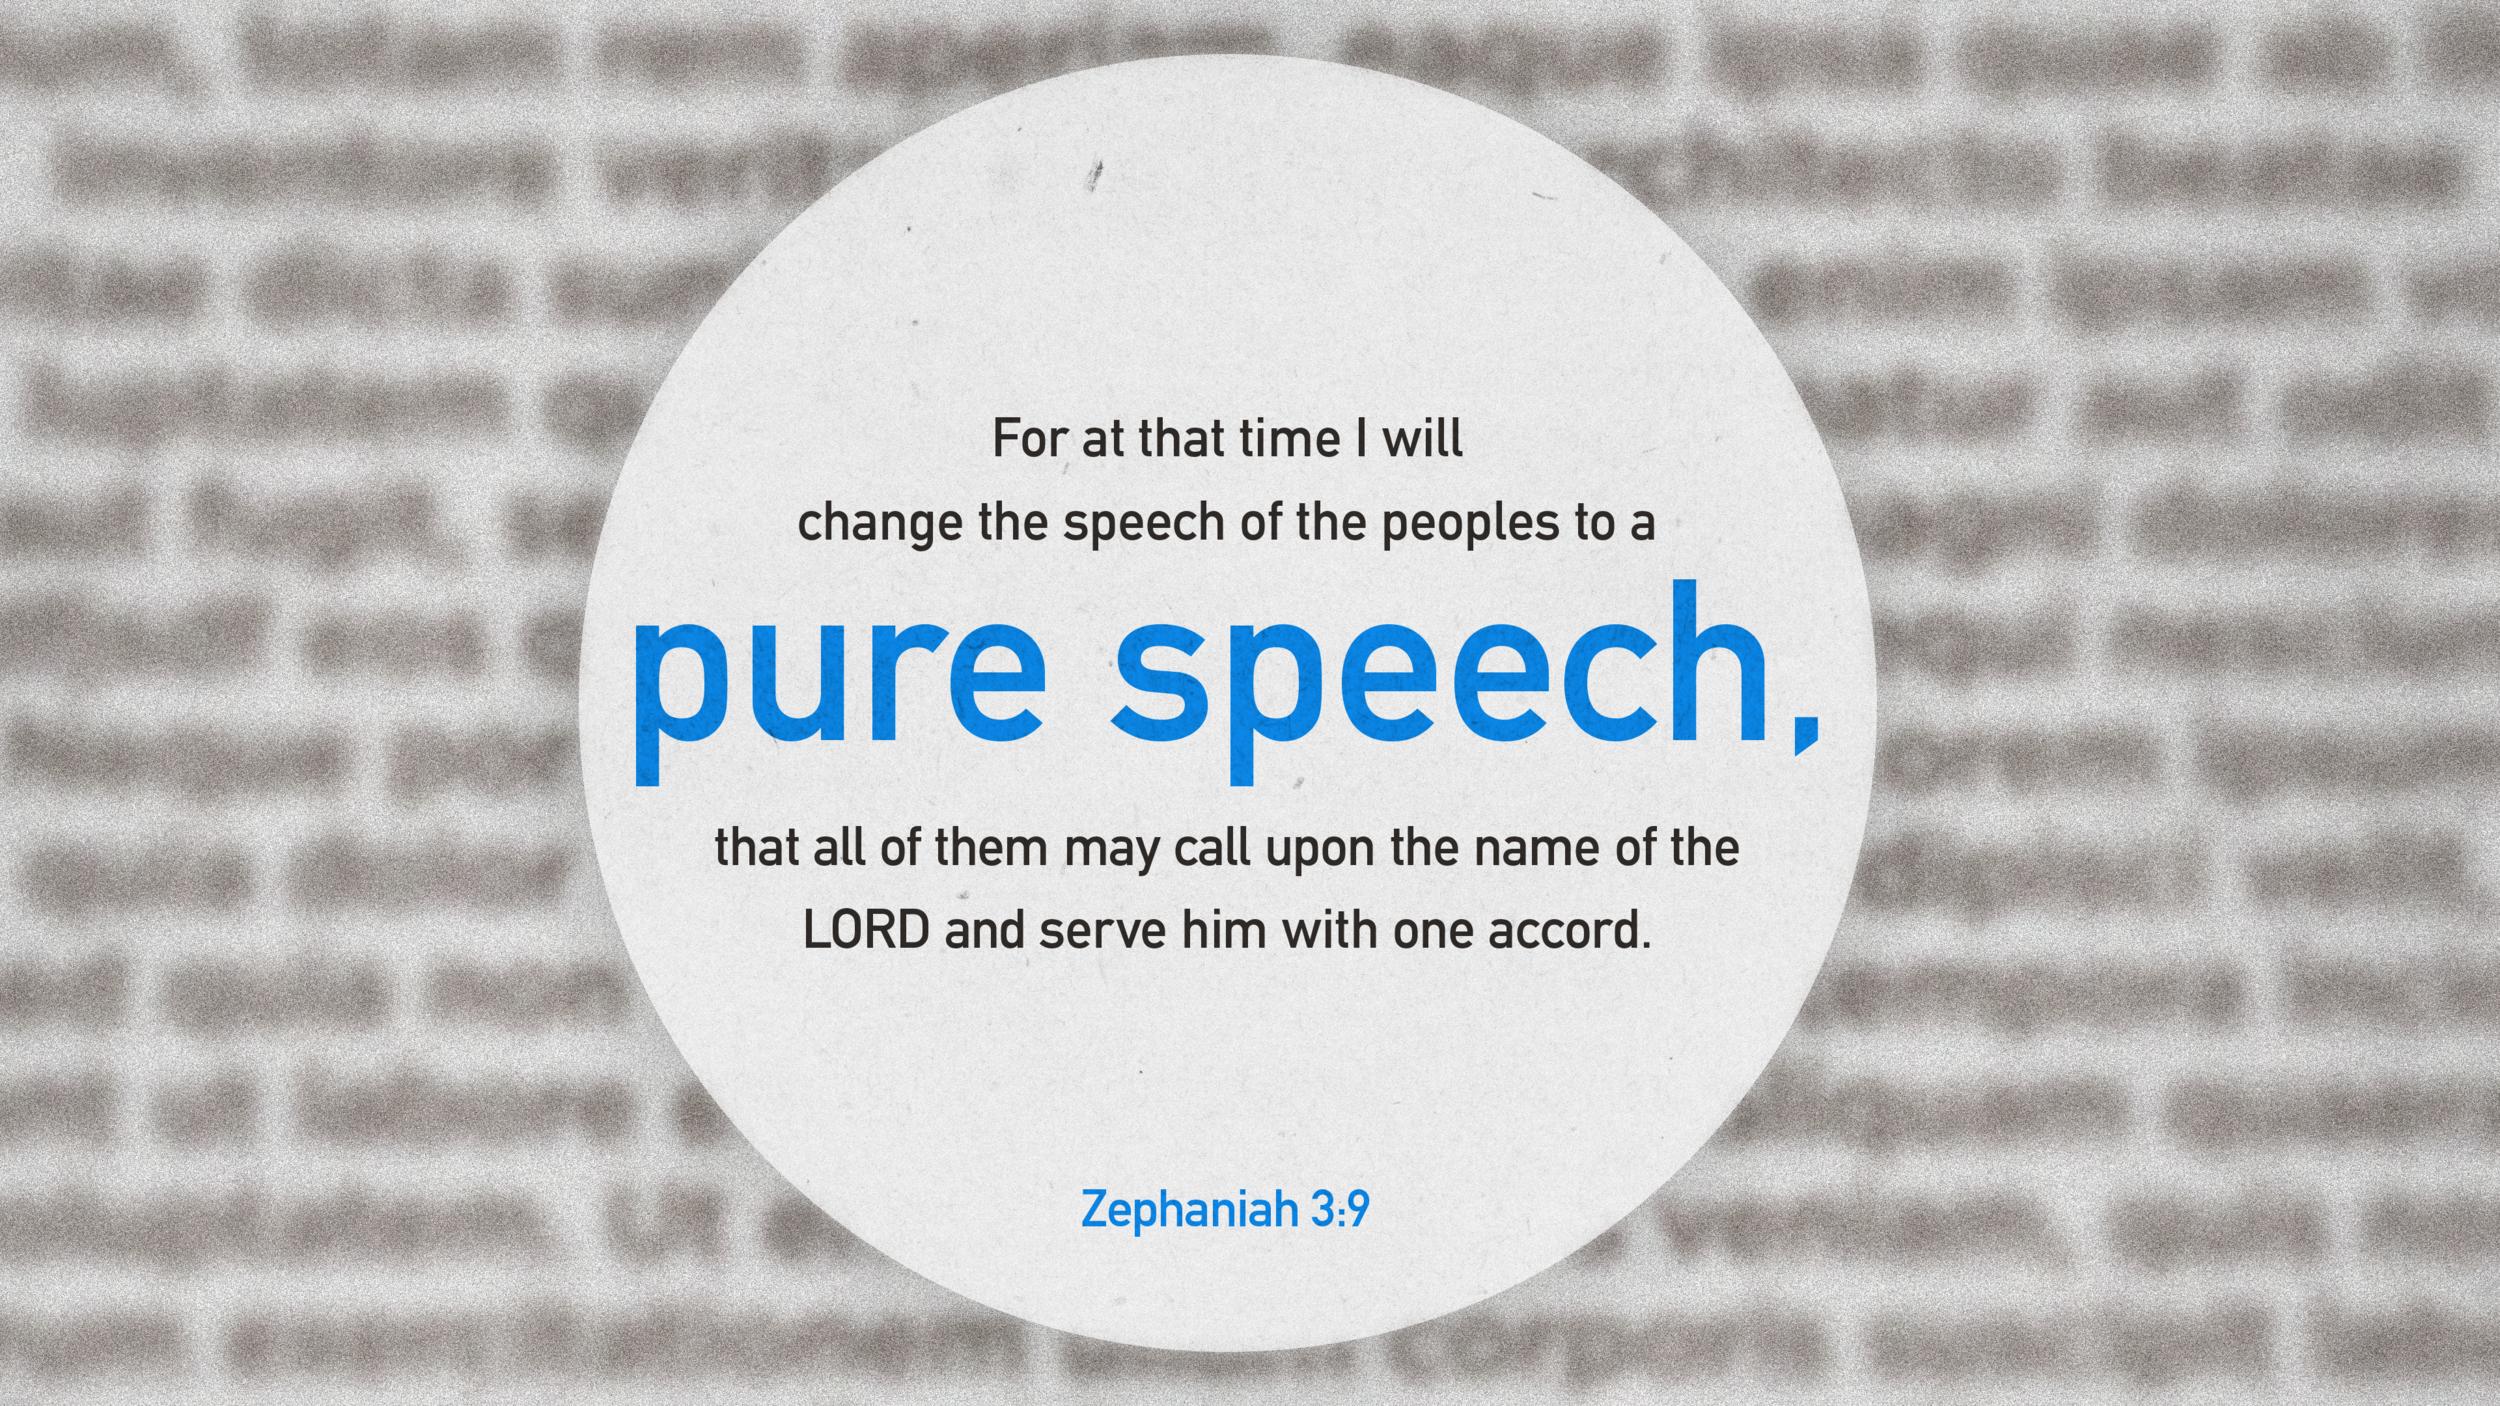 Zephaniah_3_9-3840x2160.png